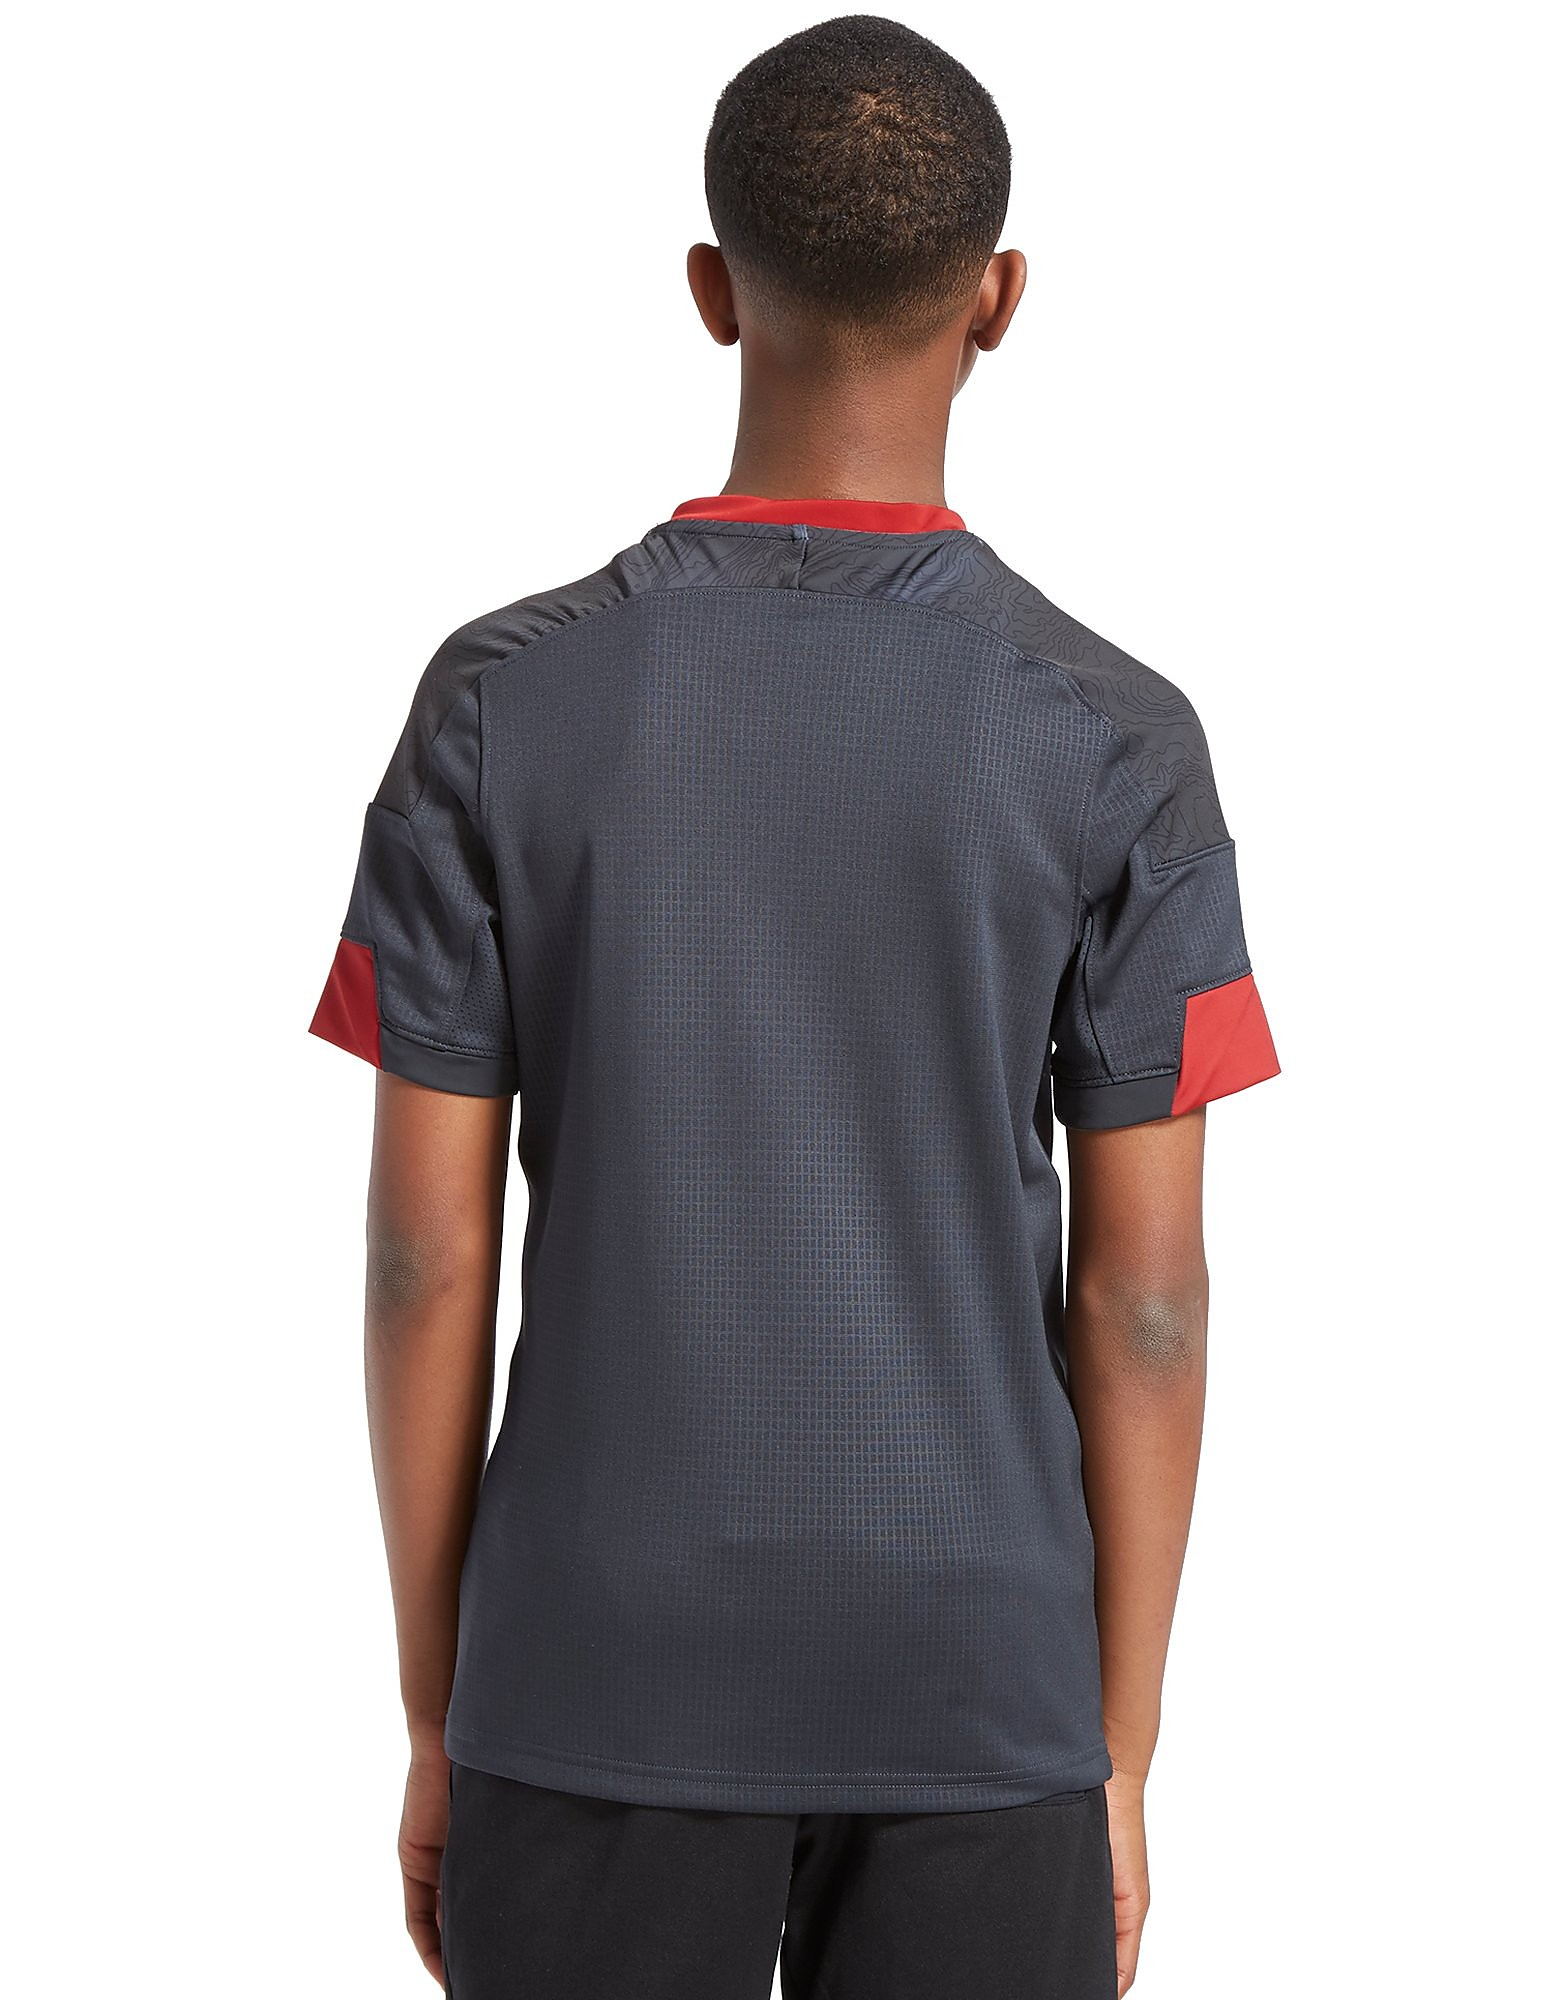 Under Armour Wales RU Away 17/18 Shirt Junior